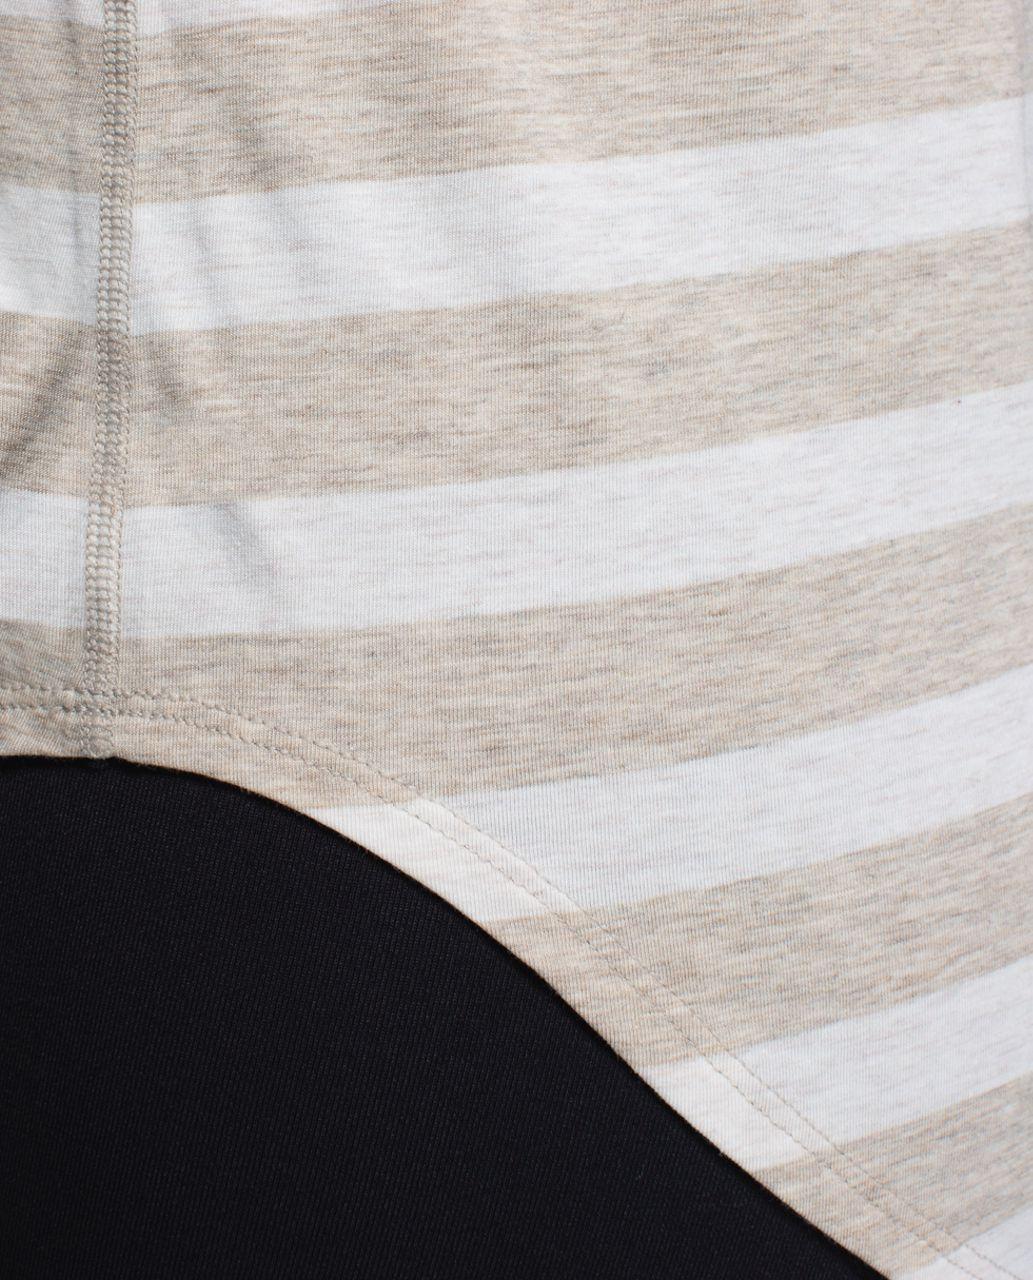 Lululemon Yogi Racerback - Marshmallow Stripe Heathered Sand Dune Black